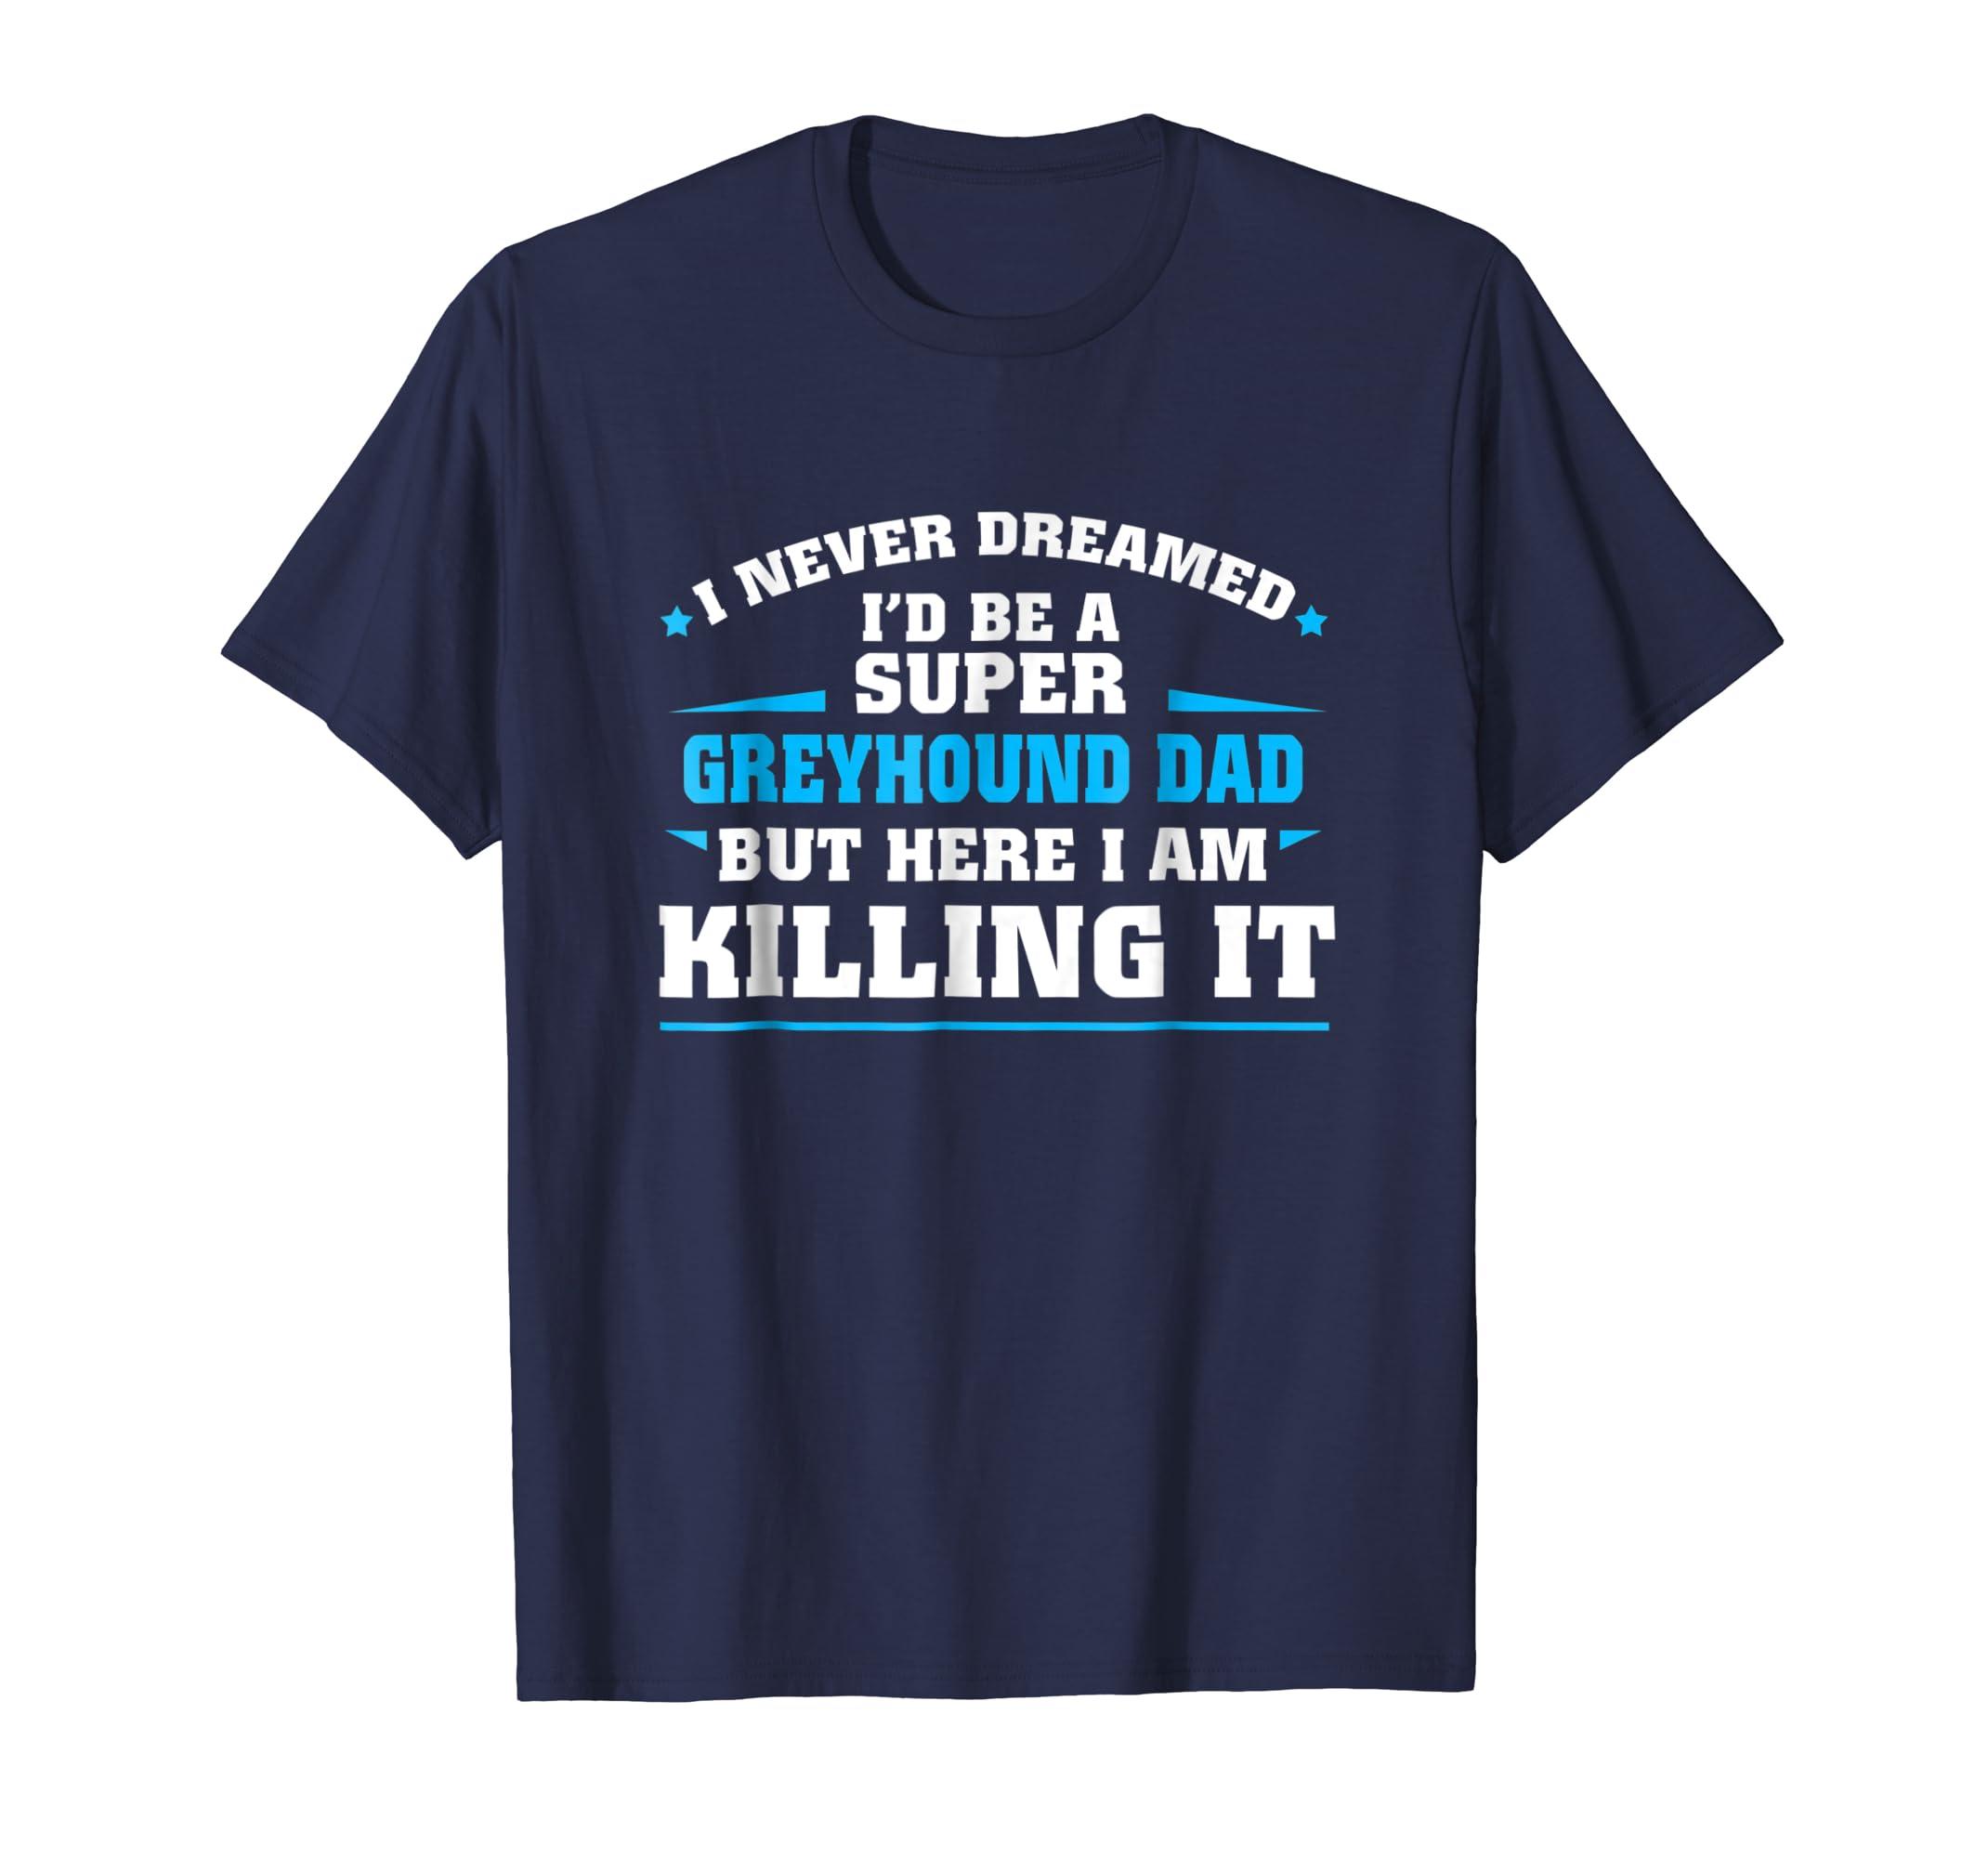 I Never Dreamed I'd be a Super GREYHOUND DAD Funny T-shirt-ANZ